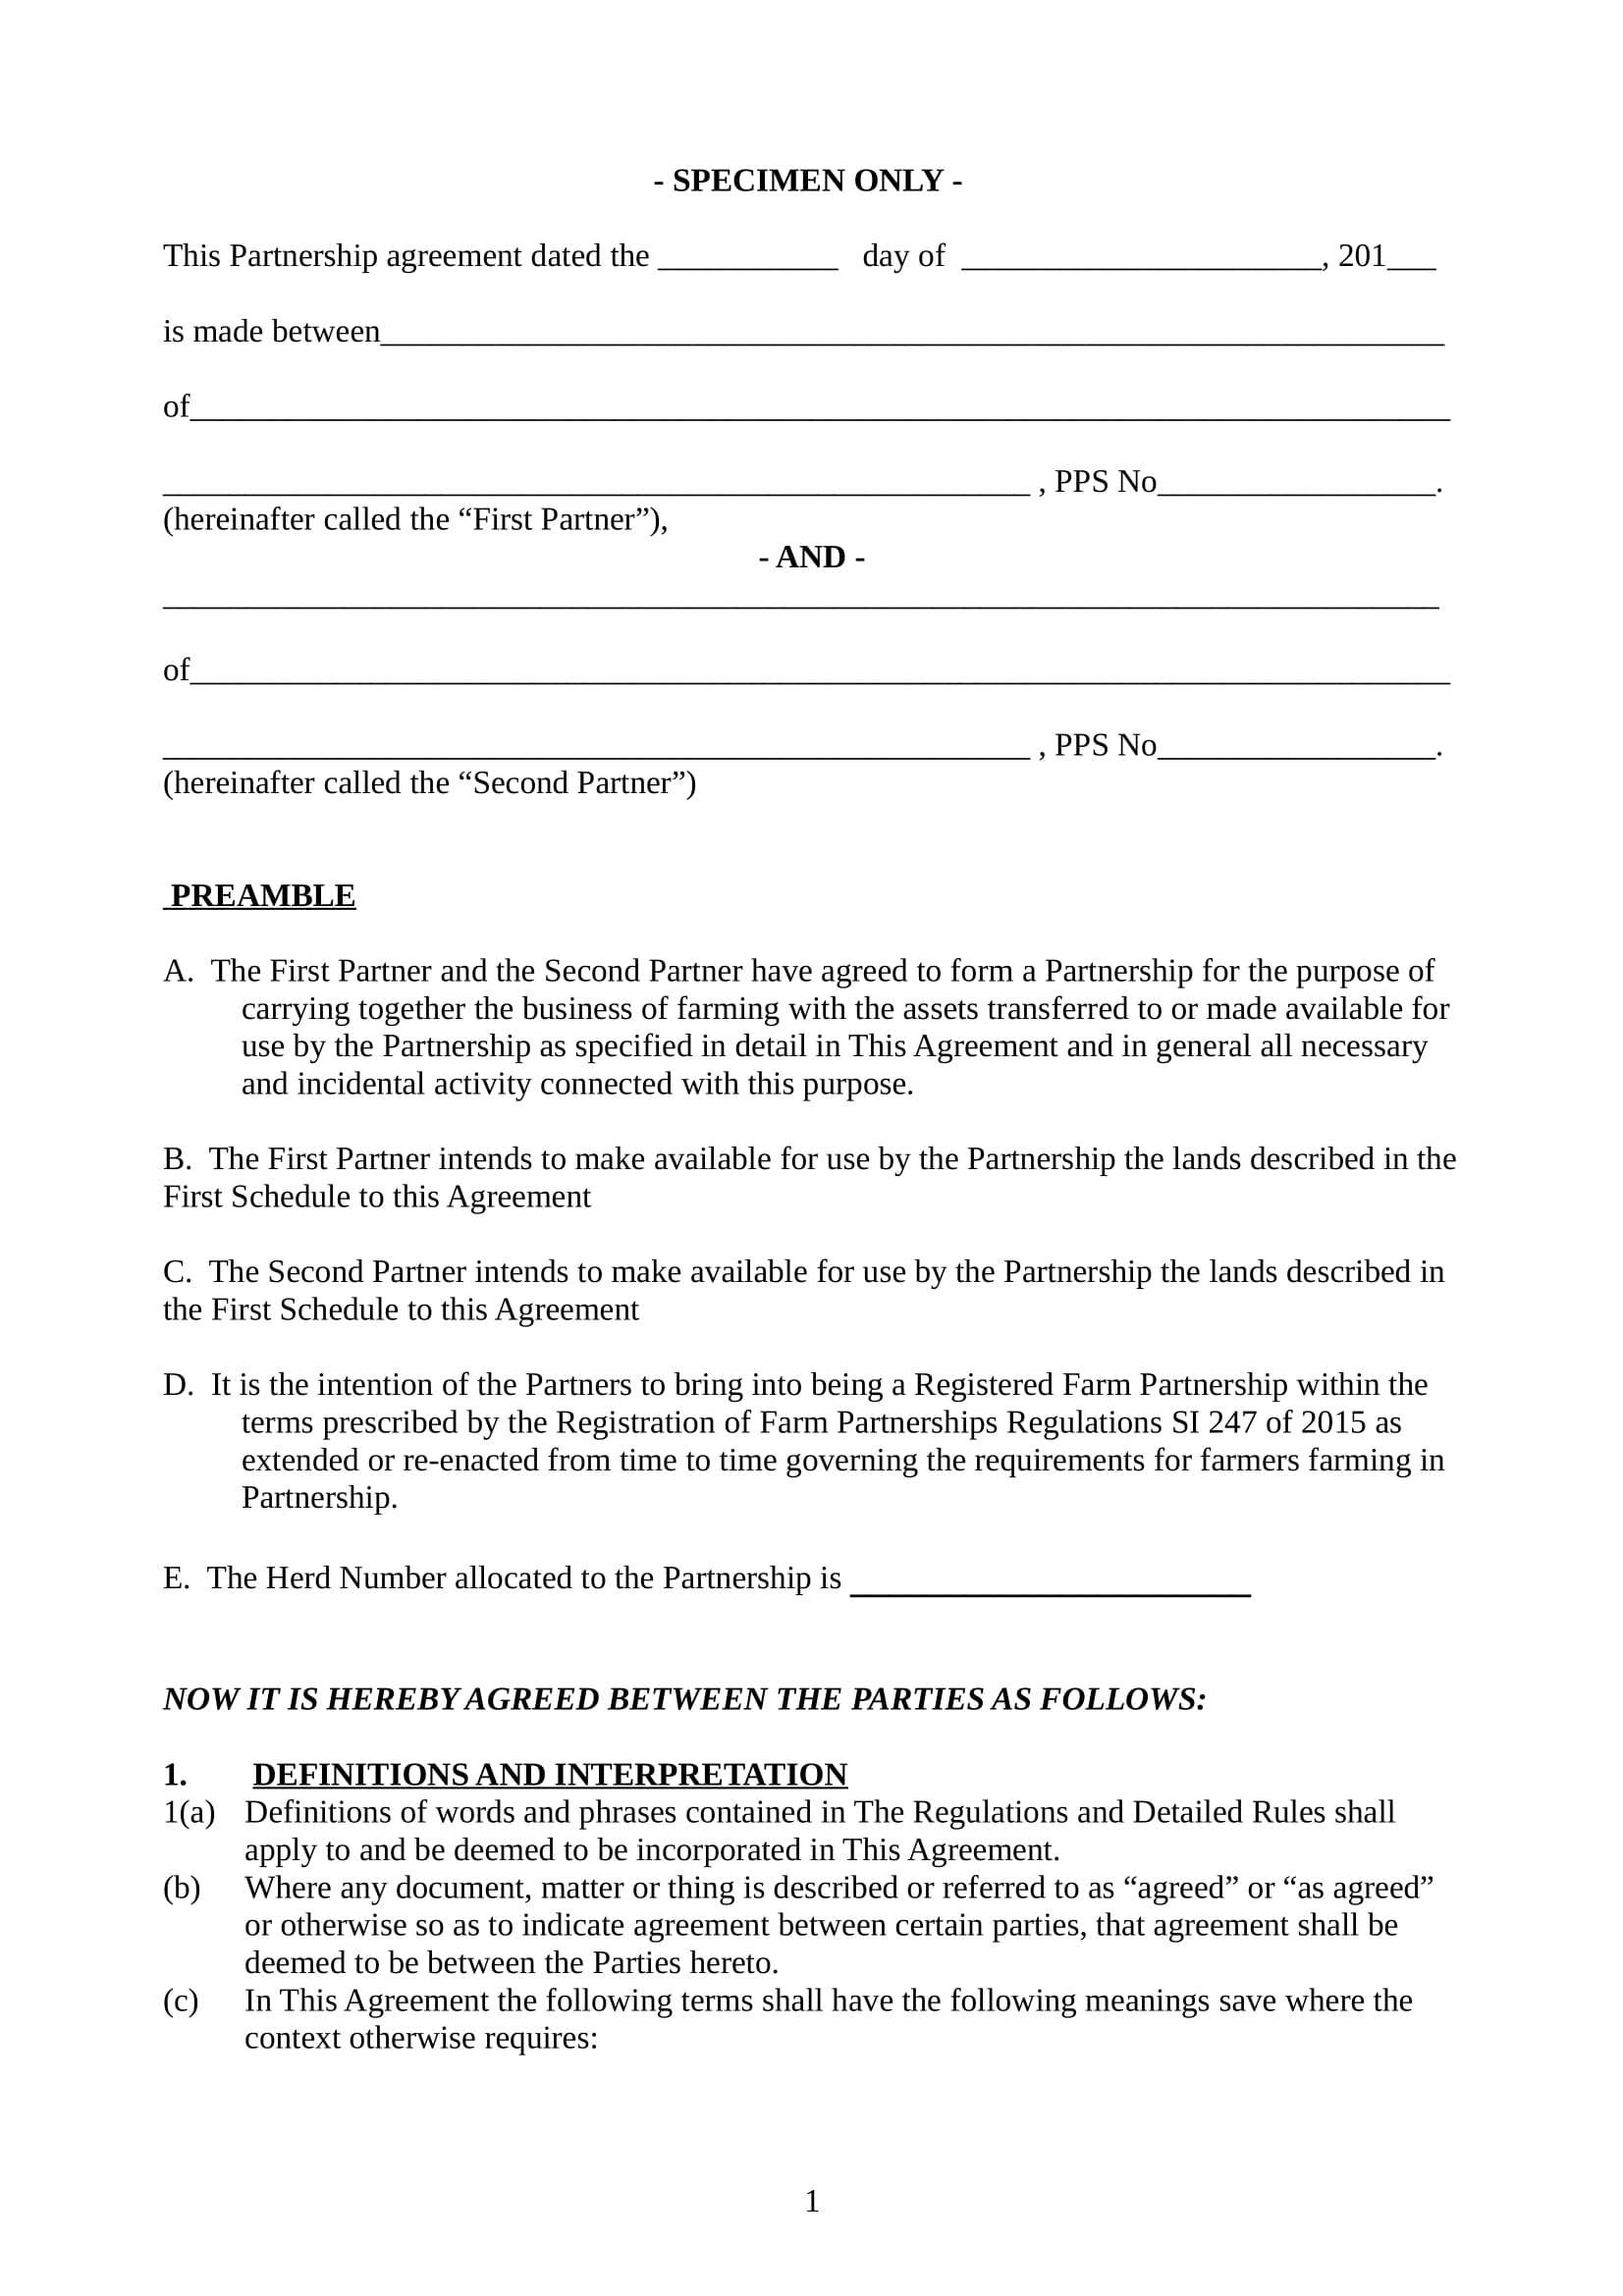 specimen farm partnership agreement contract form 02